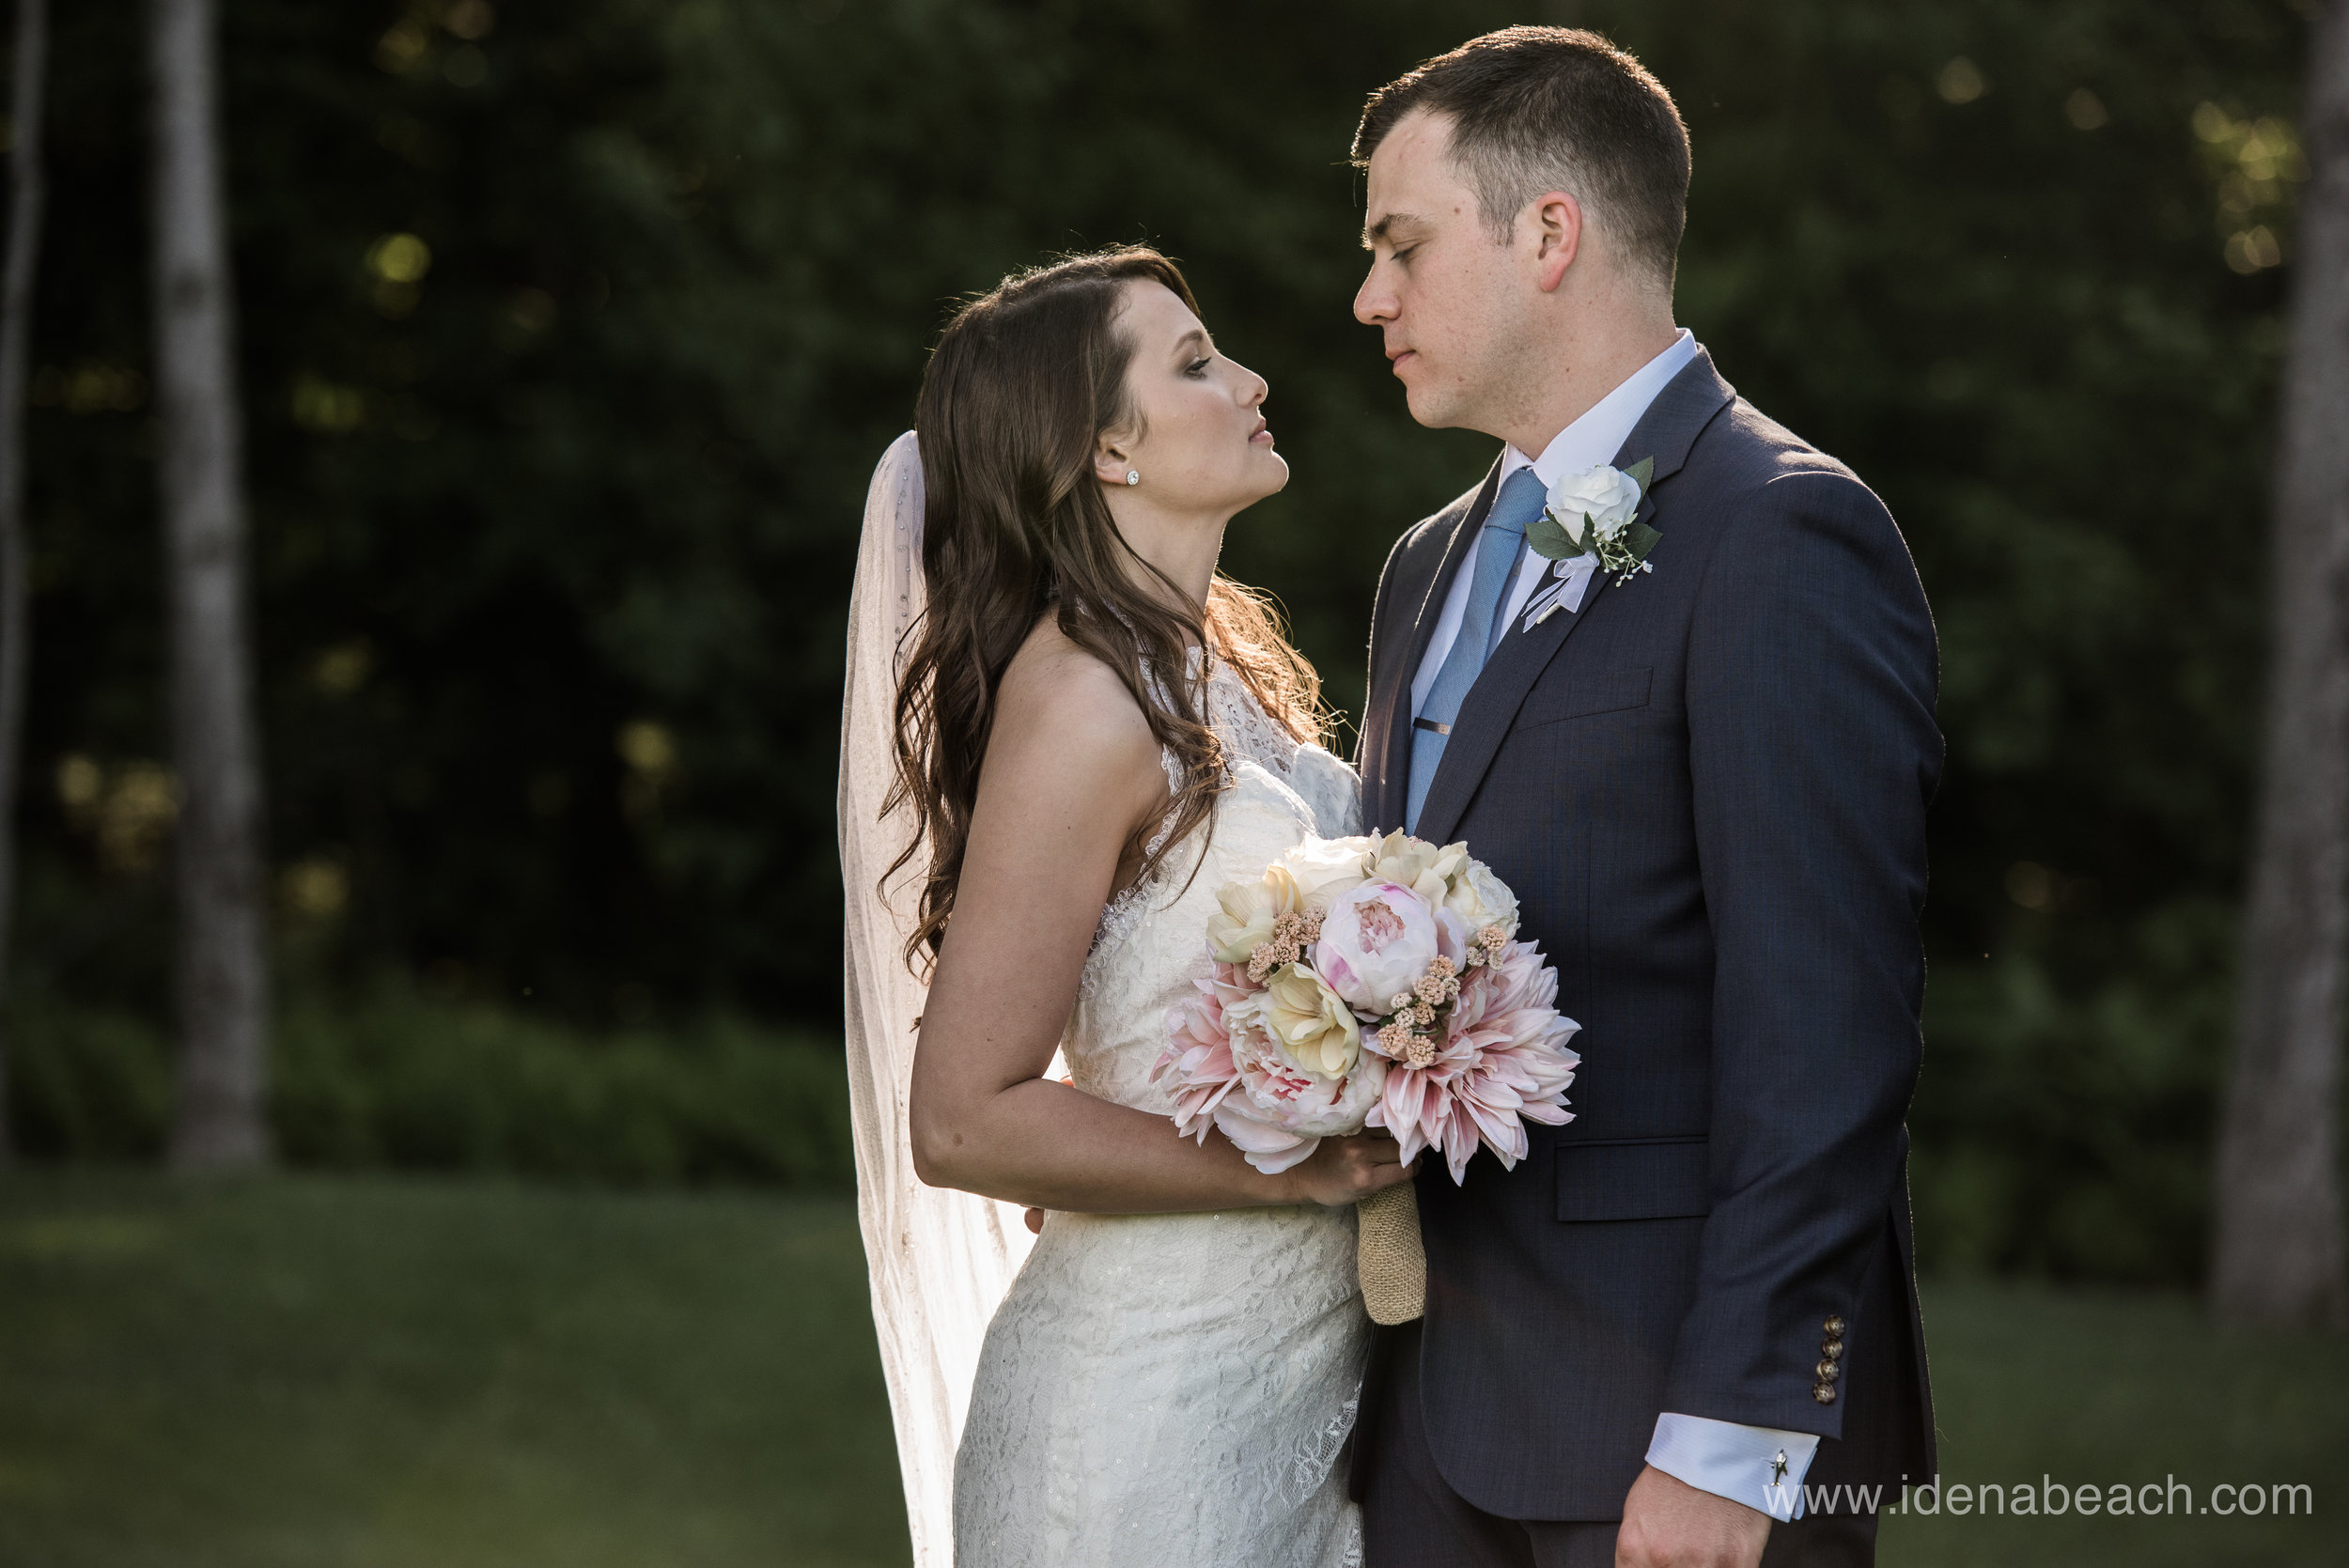 Mountain-Top-Inn-Vermont-Wedding-Photographer-100.jpg